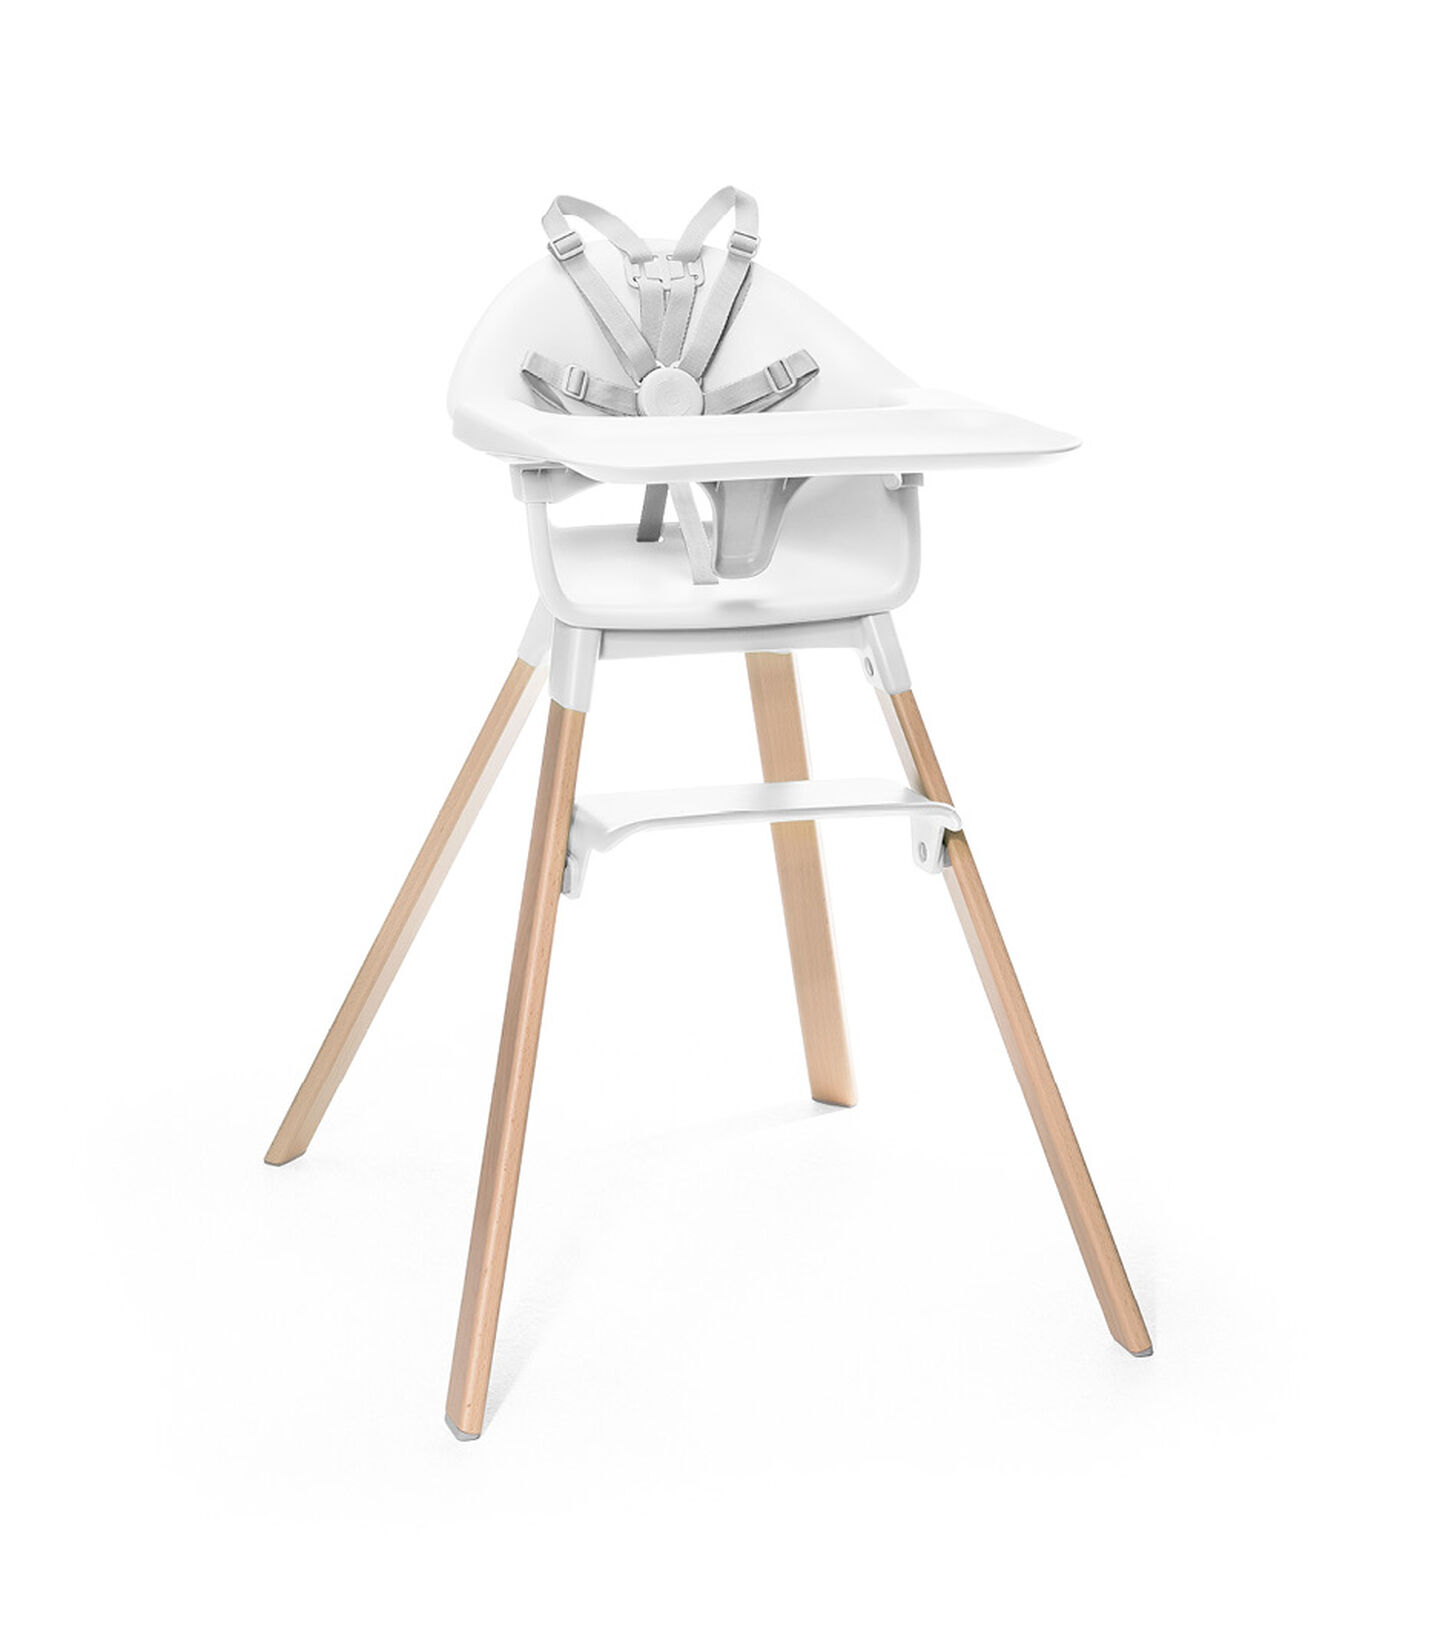 Stokke® Clikk™ High Chair White, White, mainview